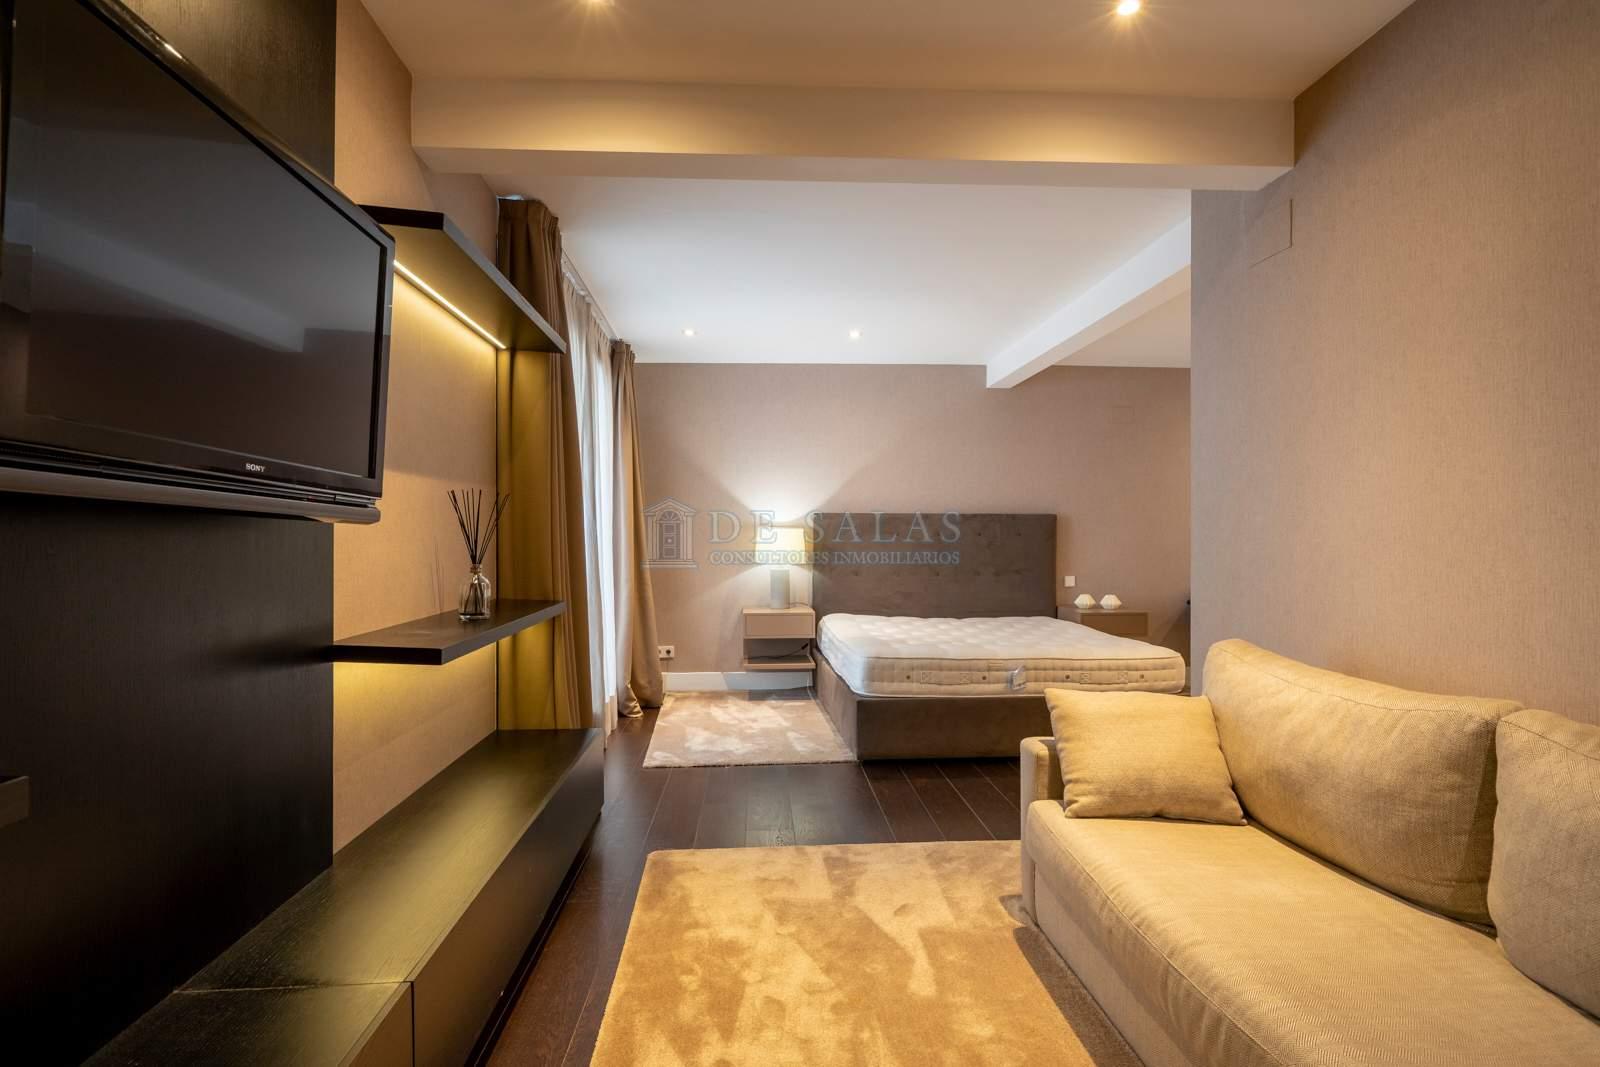 Dormitorio inv. 2-39 Maison La Moraleja